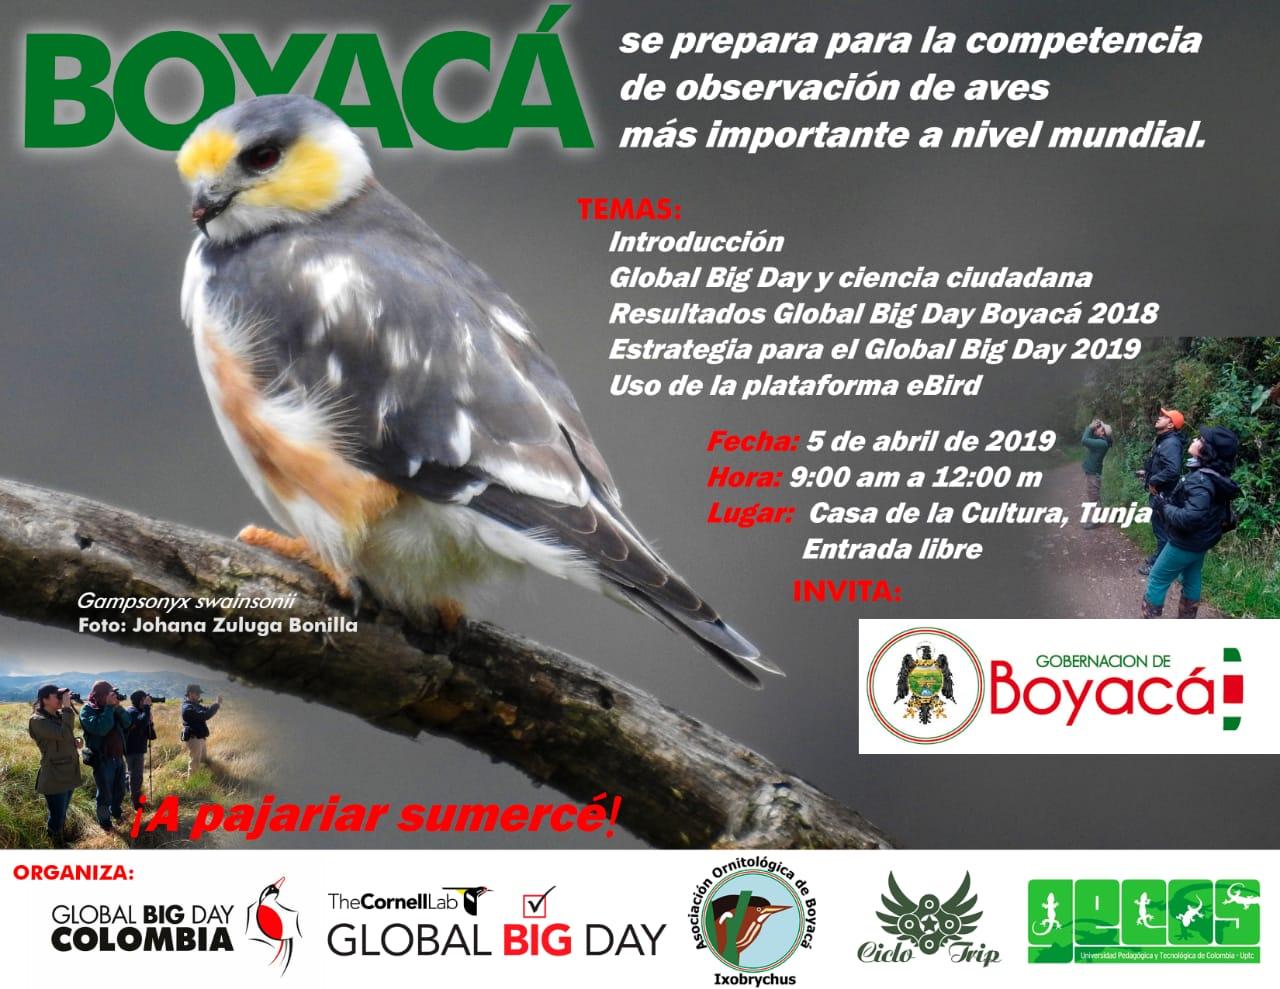 Invitacion global big day boyaca